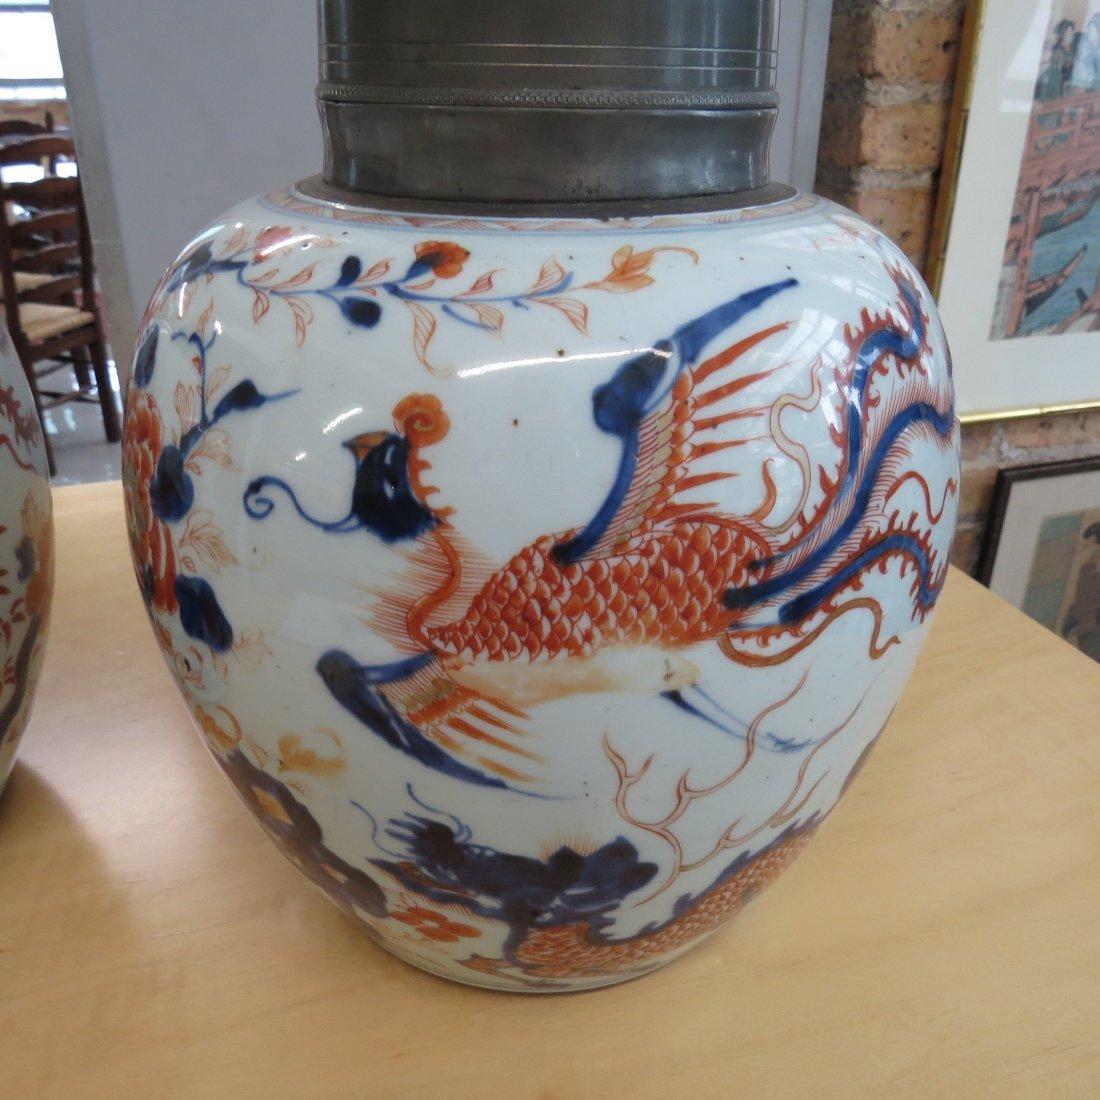 A Pair of 18th Century Chinese Porcelain Tea Caddies. - 5